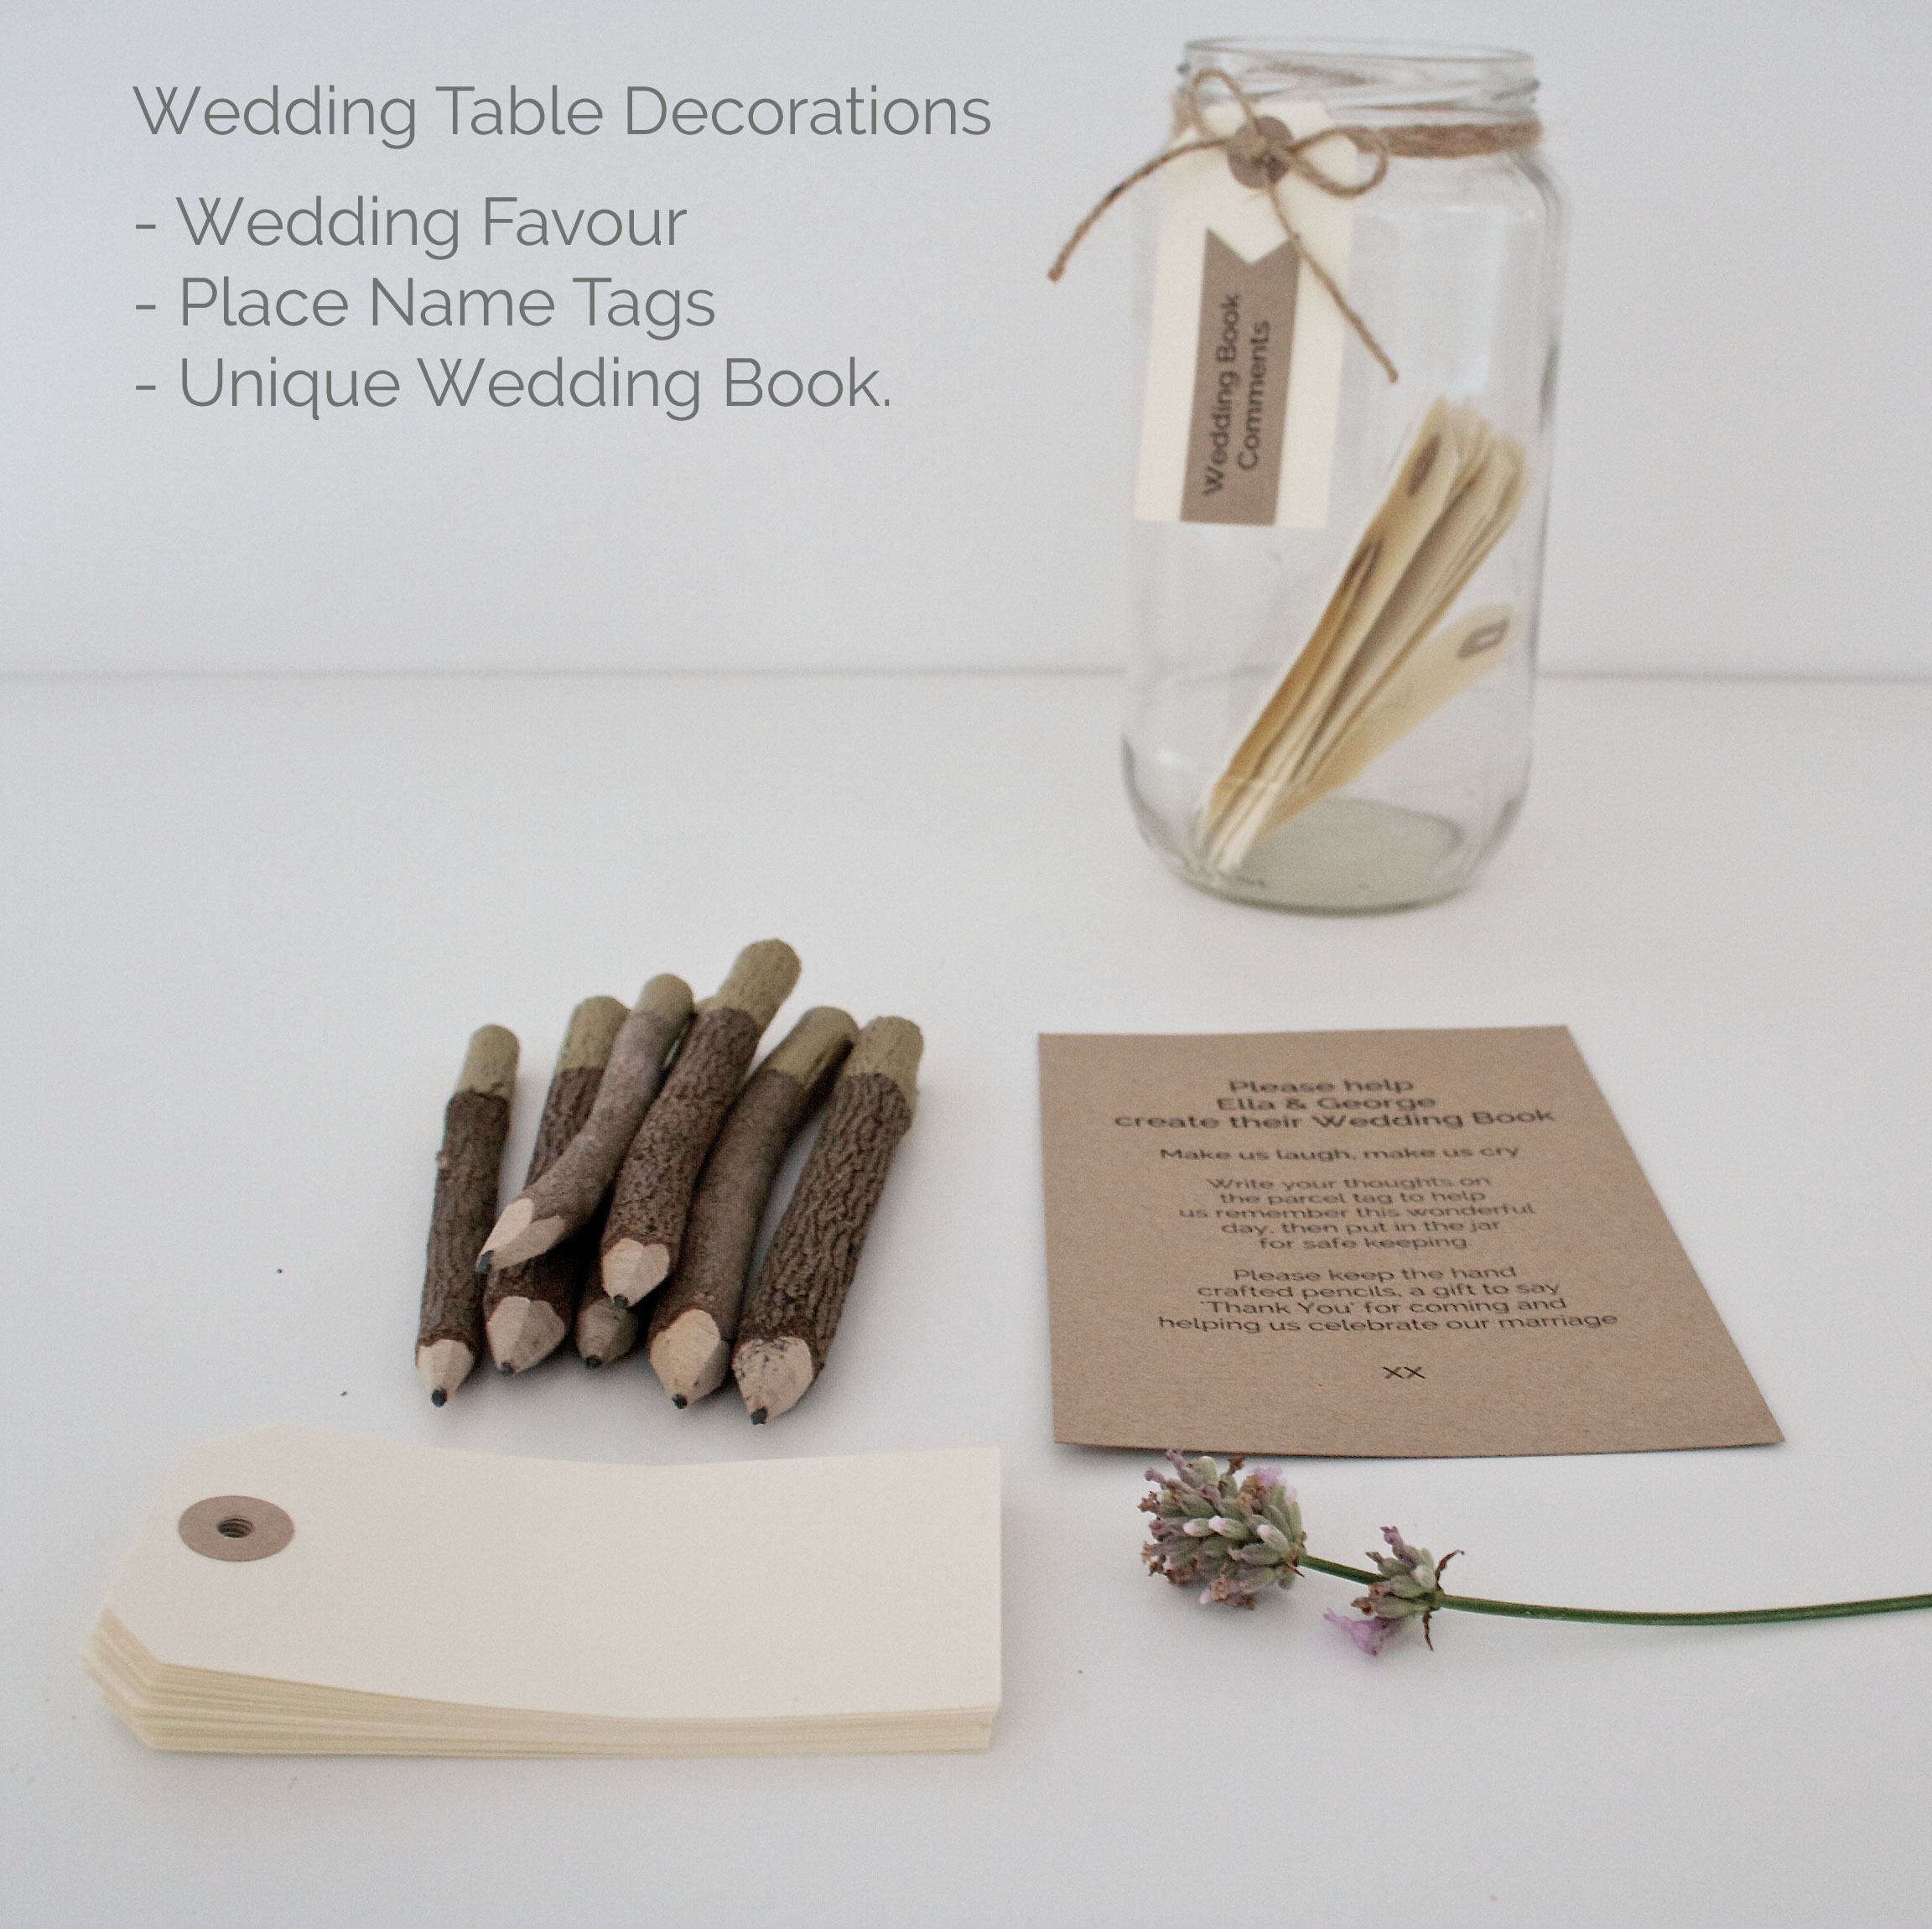 wedding-tutorial-image-1